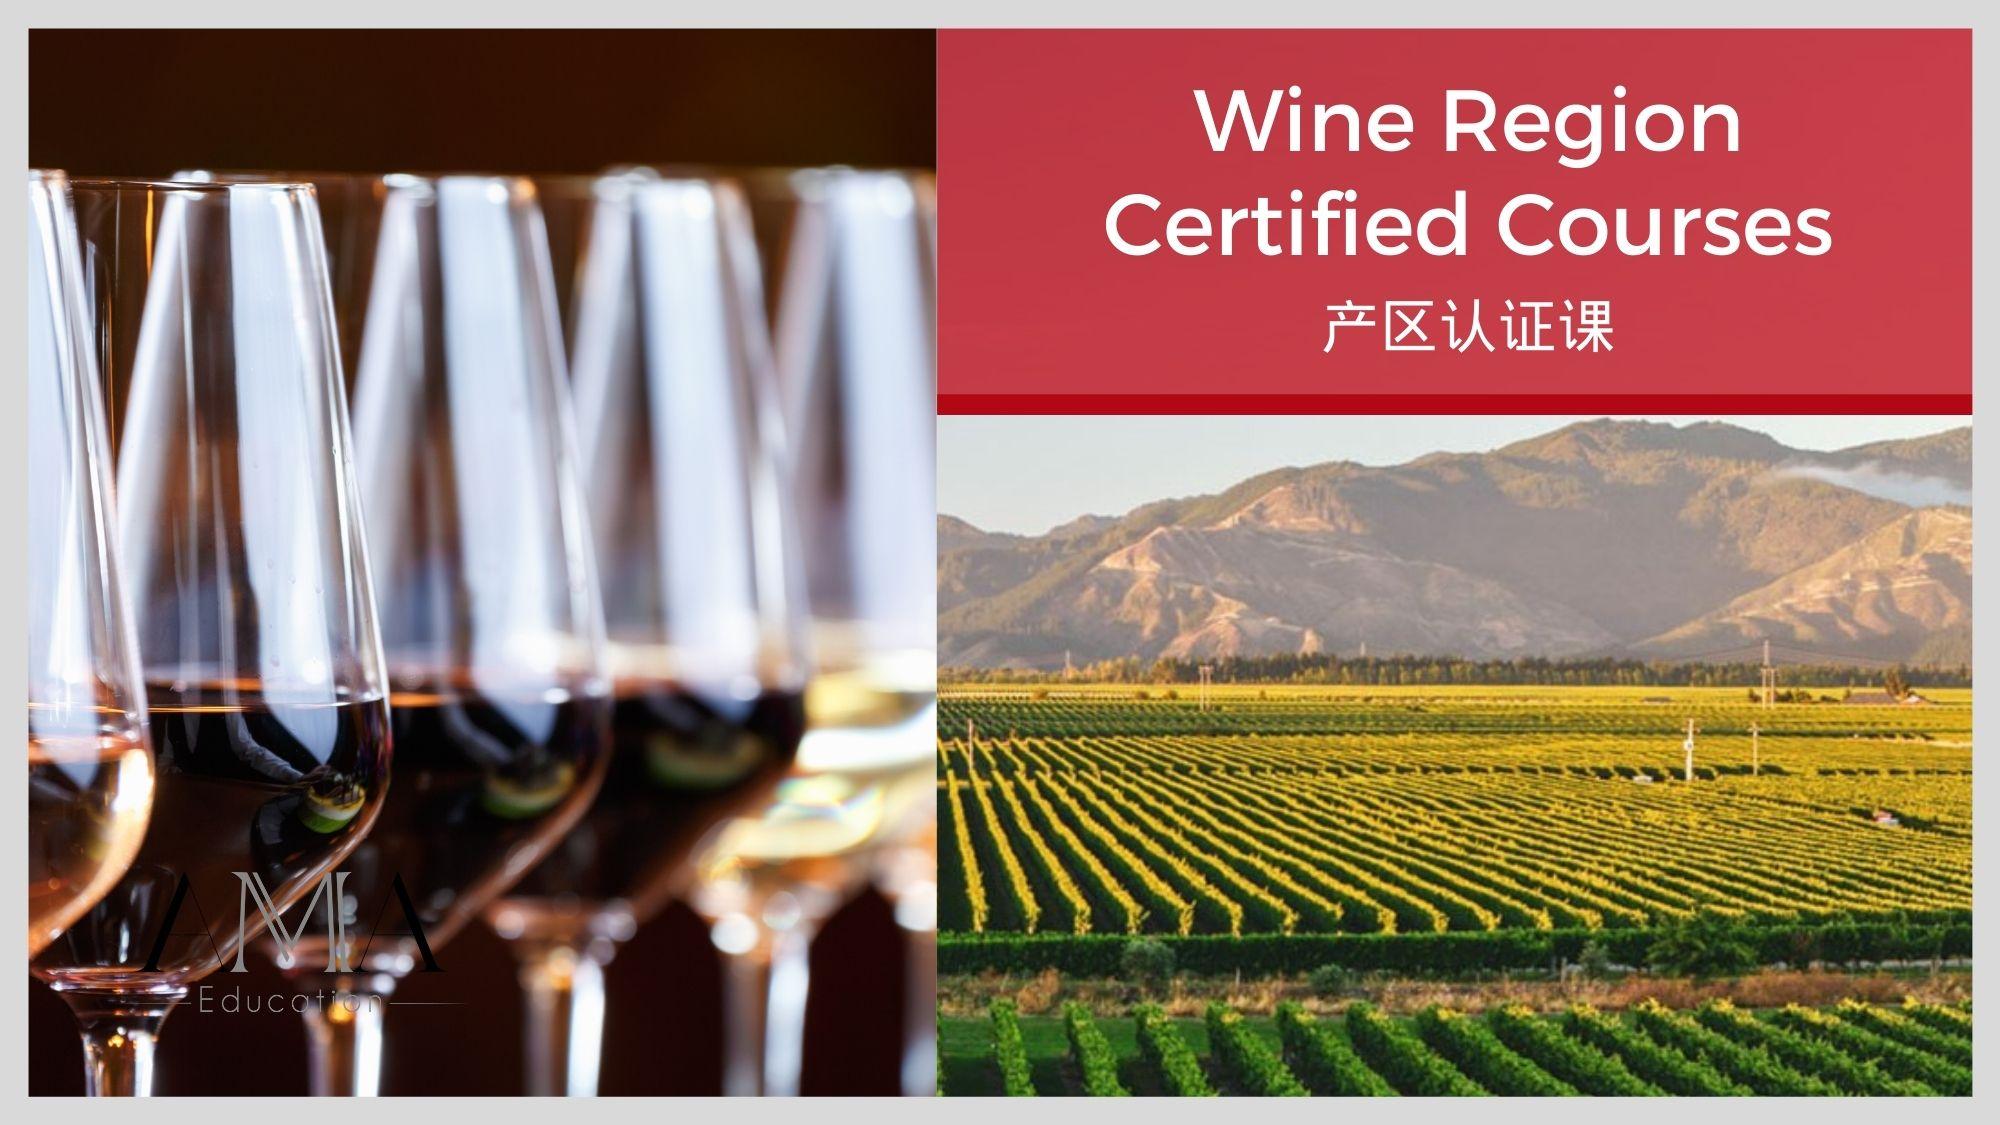 AMA Wine Region Certified Courses - Alexandre MA